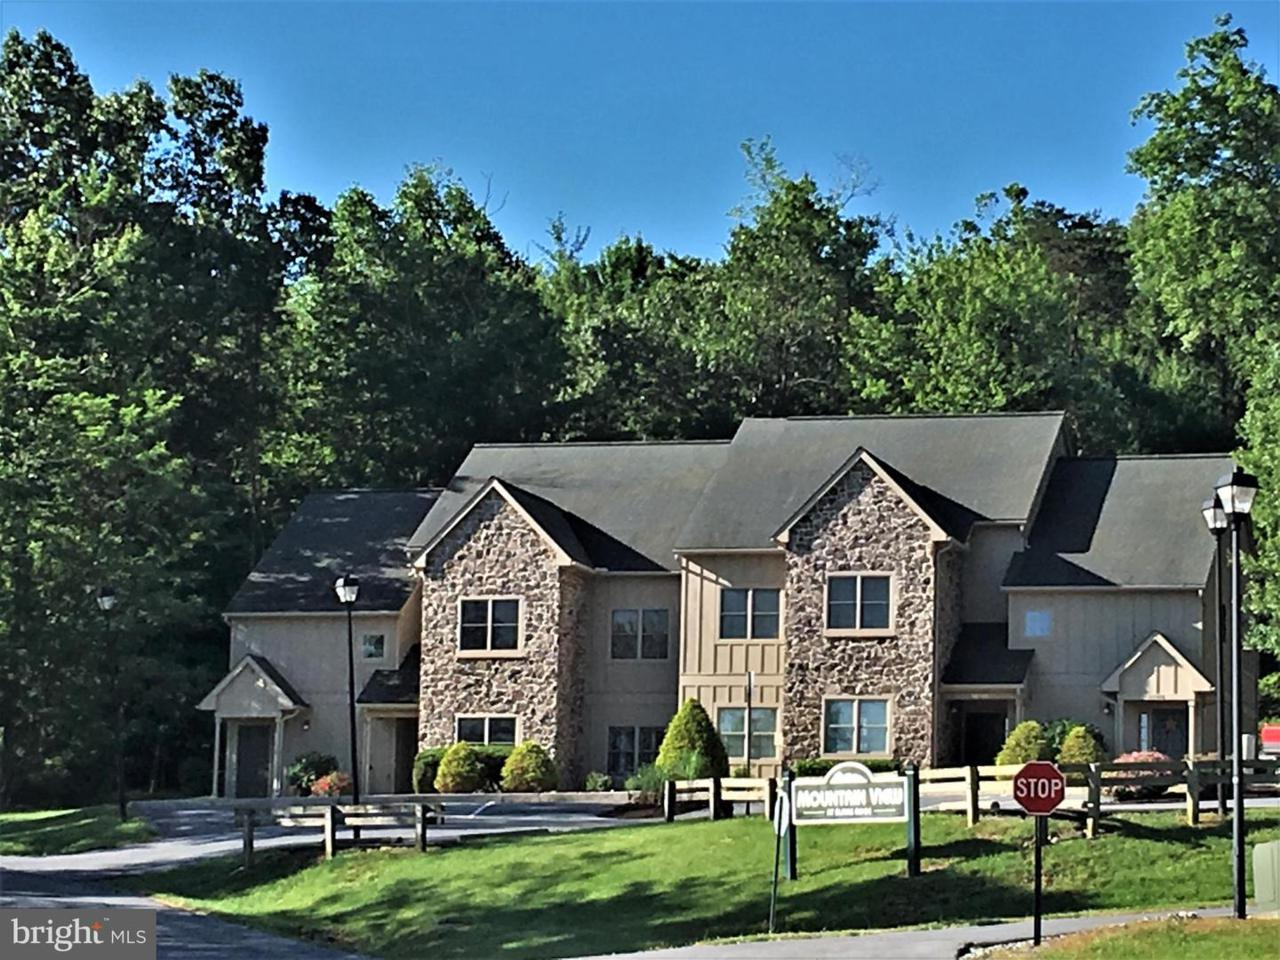 14082 Blairs Ridge Drive - Photo 1